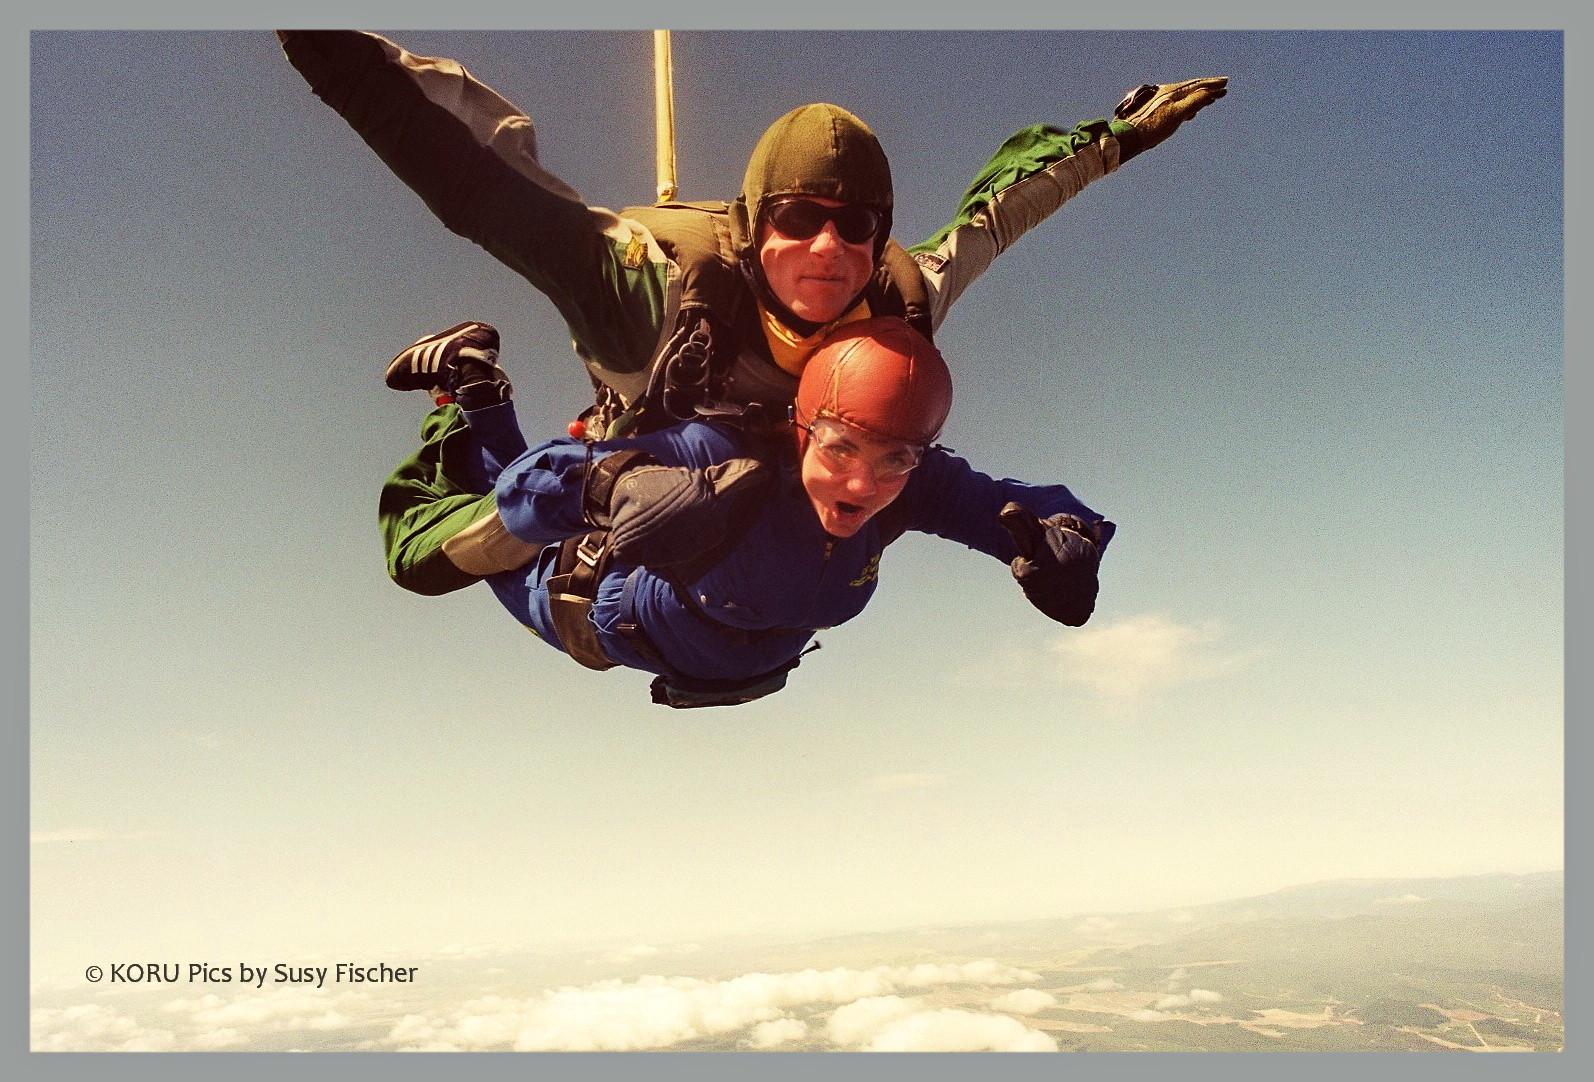 Skydive (Taupo)